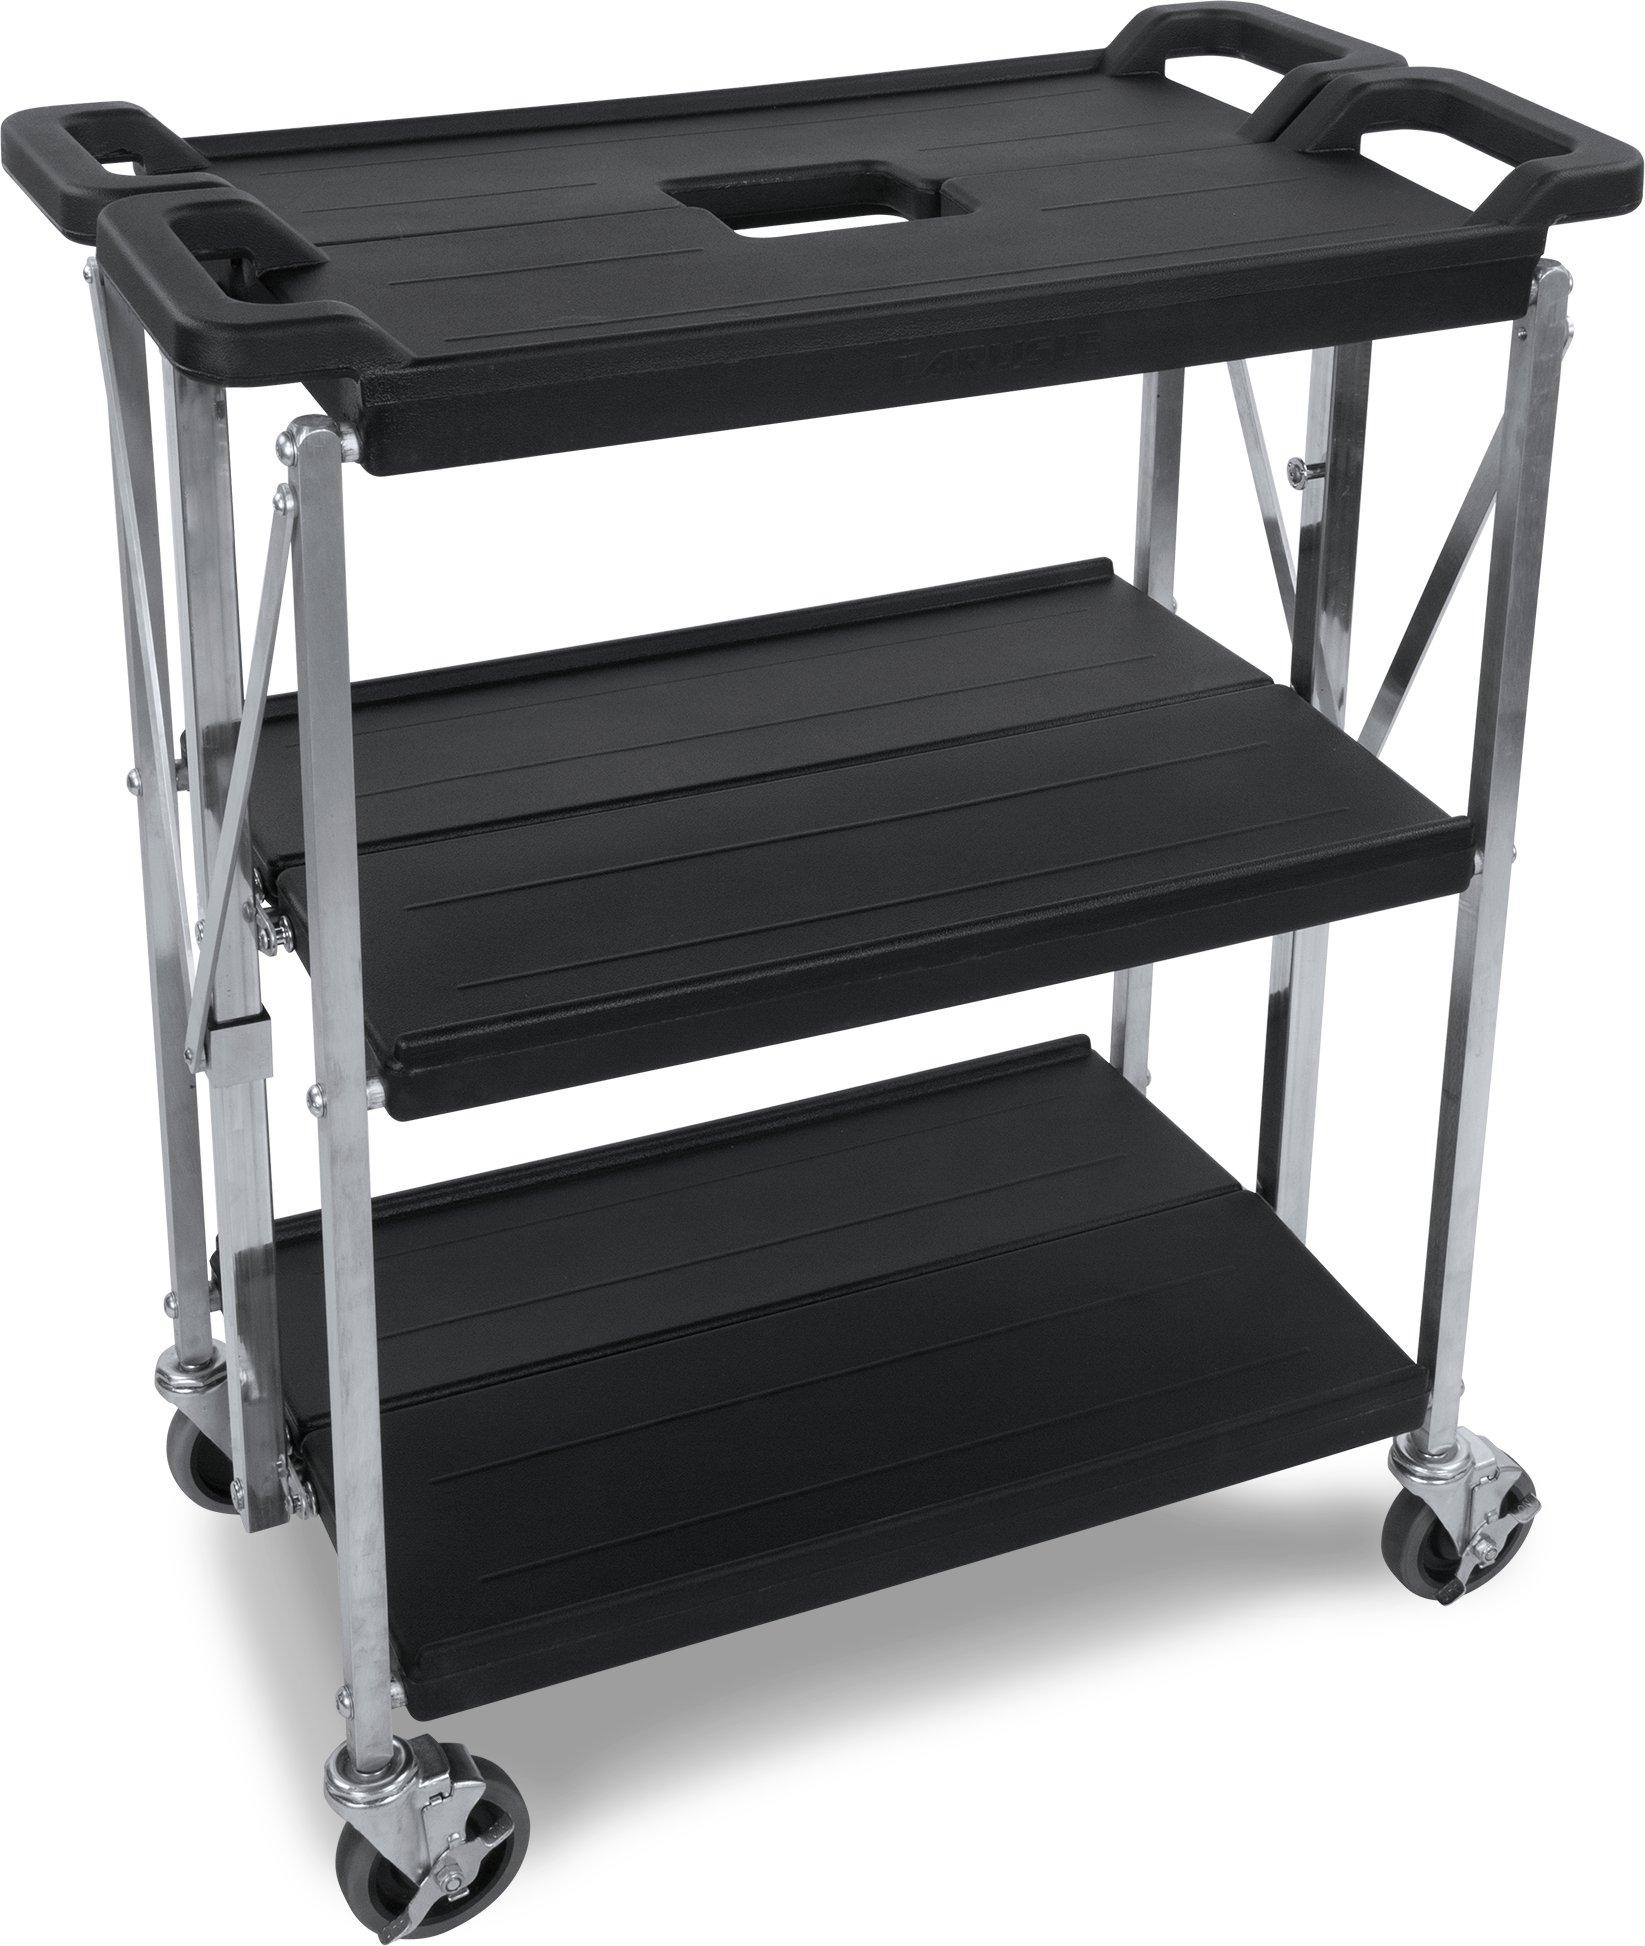 Carlisle SBC152103 Fold 'N Go Collapsible Utility Cart, 350 Pound Capacity, 21'' Length x 15'' Width Shelf, Black